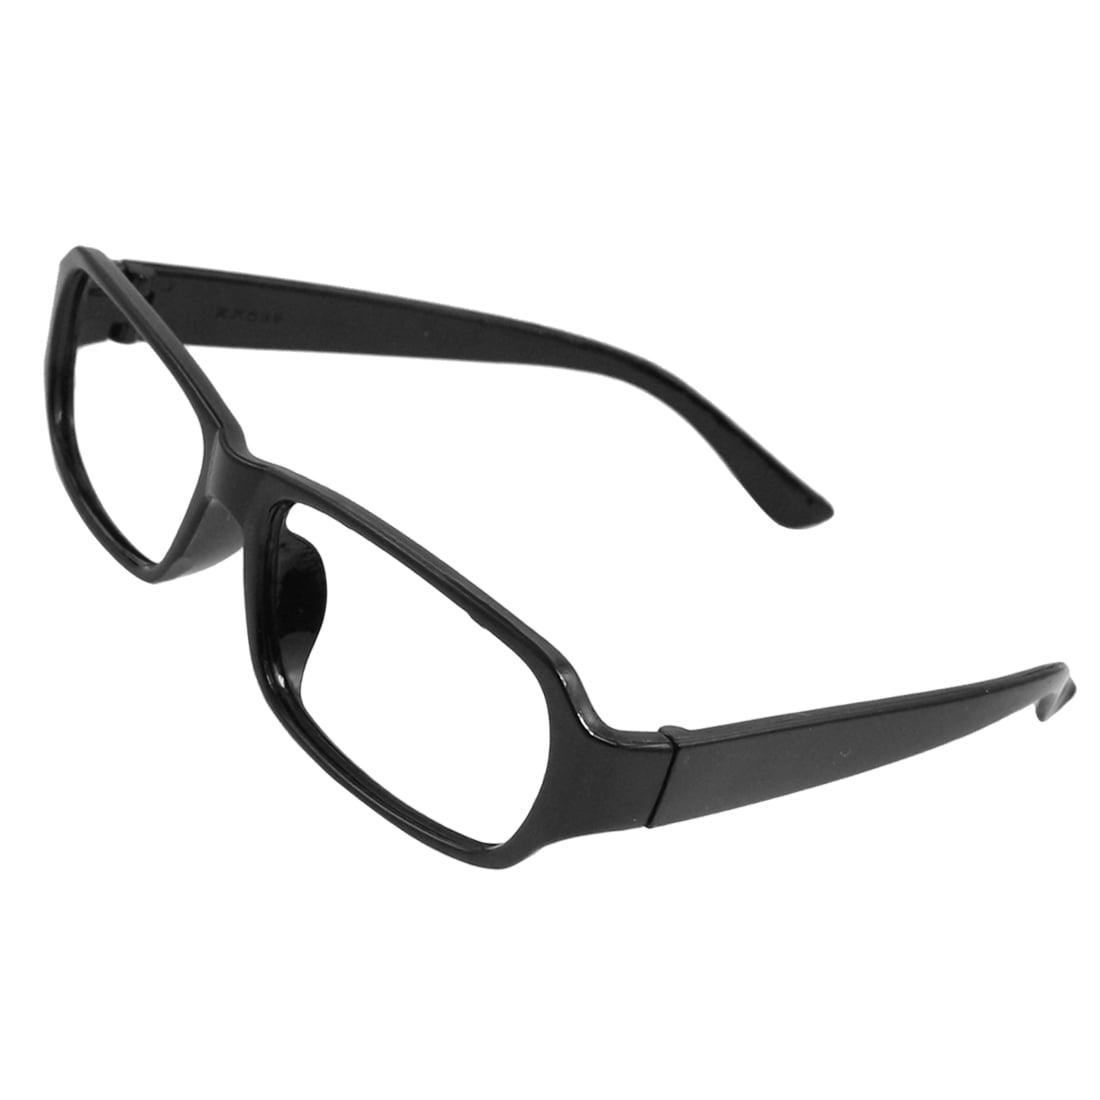 03902f96d4bd Contour Womens Prescription Glasses, FM14078 Shiny Gold Walmart Glasses  Frames: Optical Frames